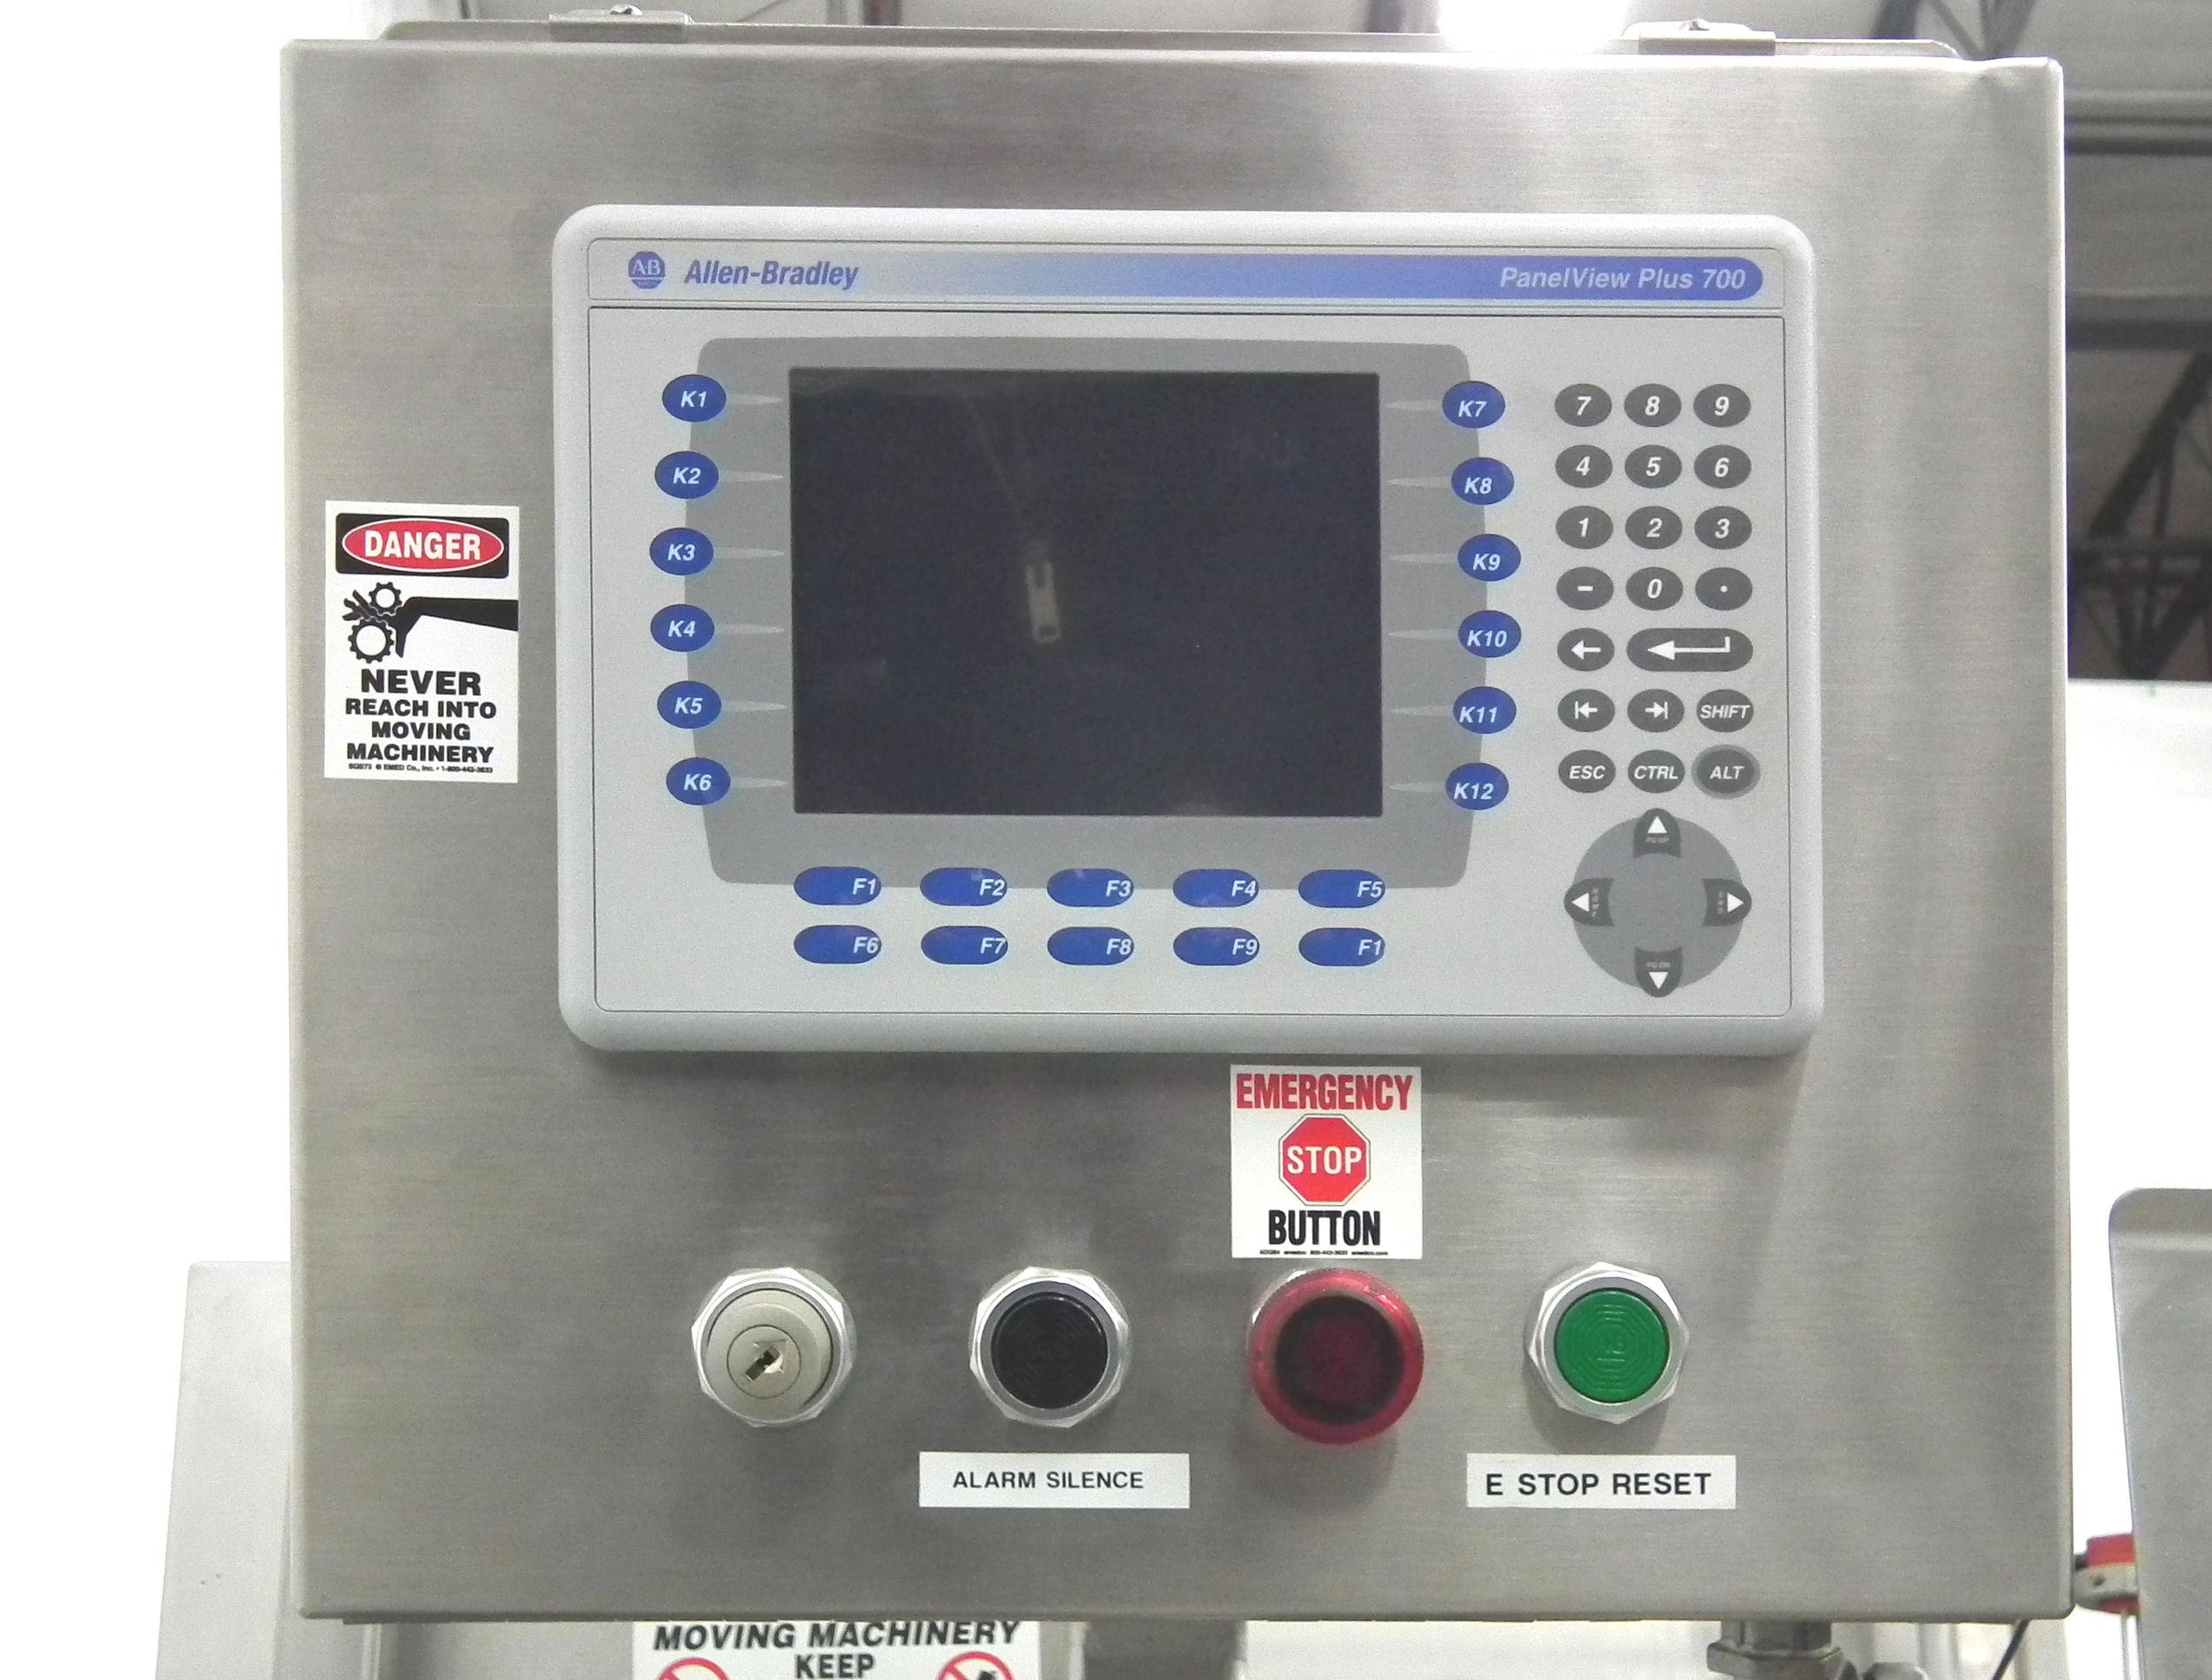 TSA Bakery Filling Depositor A8189 - Image 8 of 9